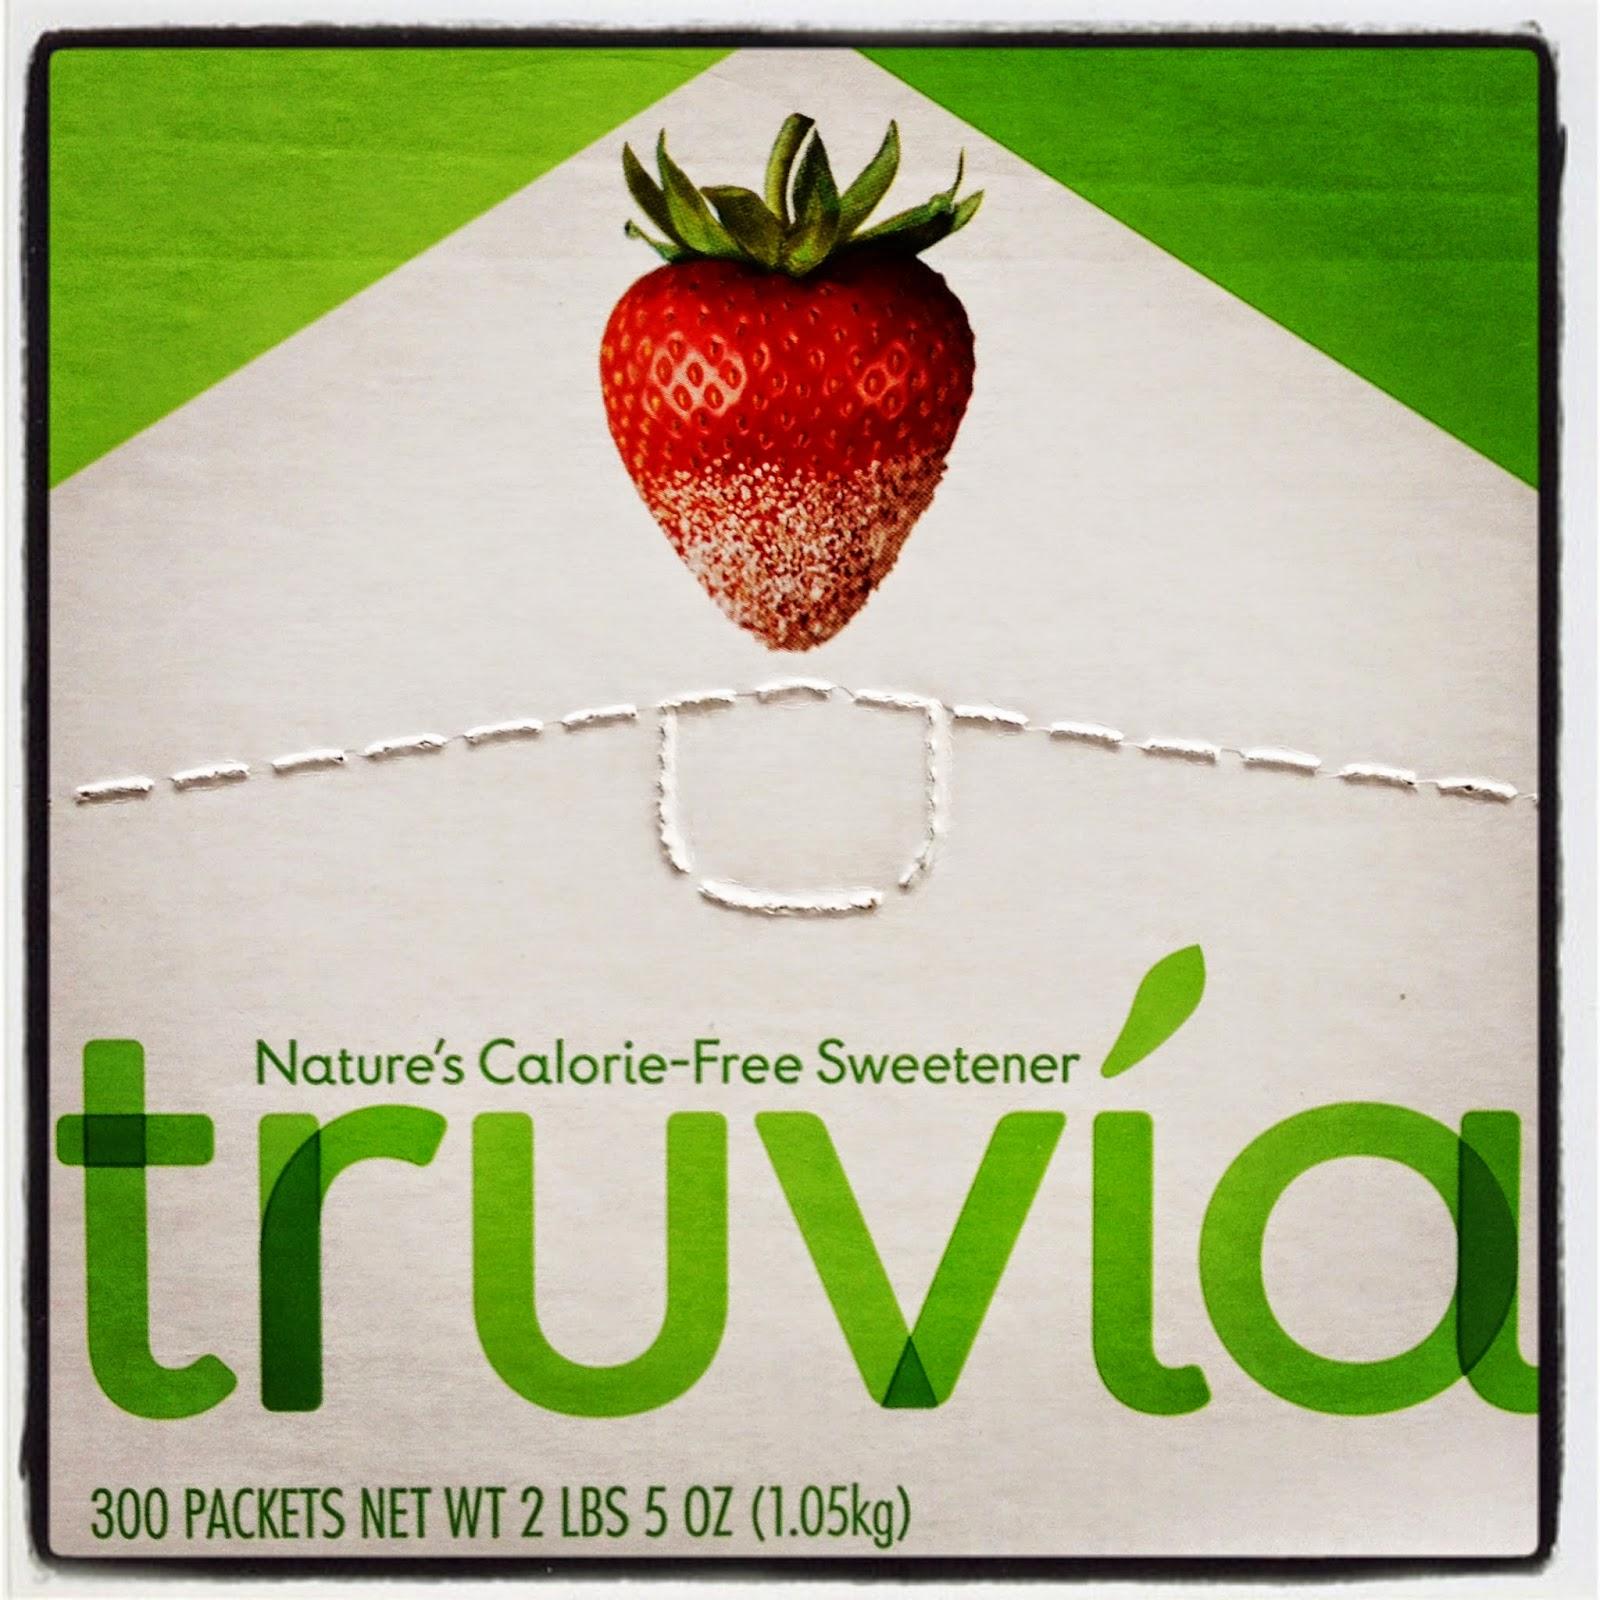 Truvia Stevia Costco Vegan